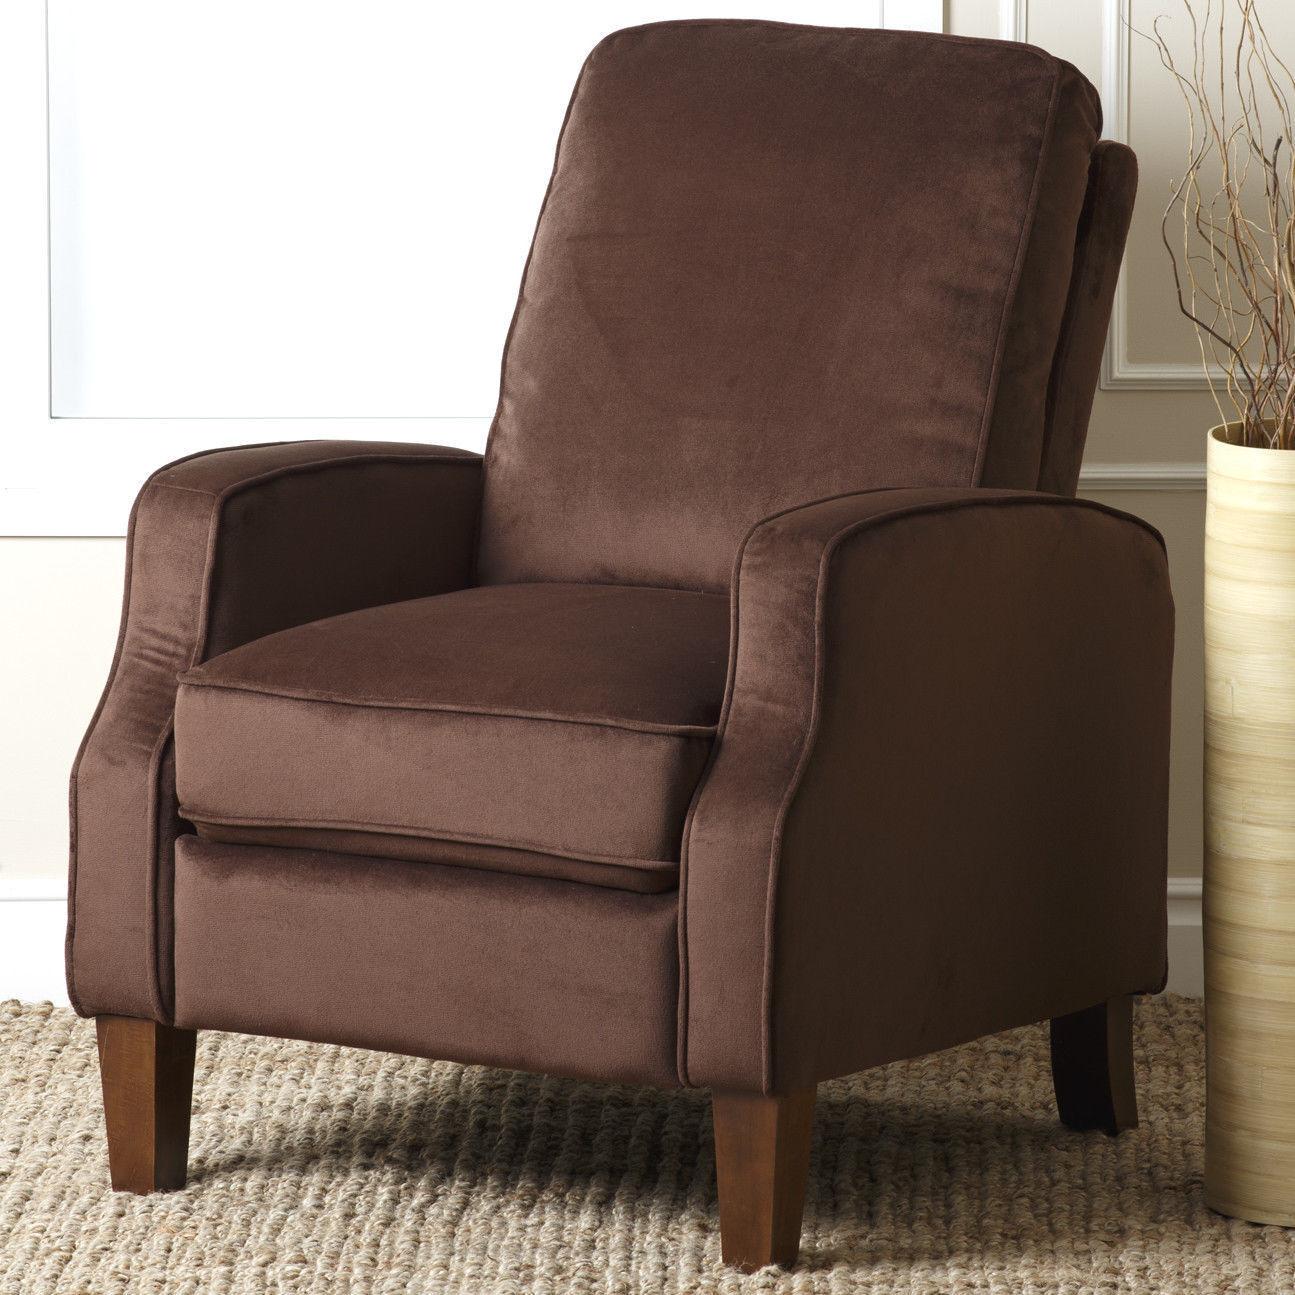 best chair after back surgery tilting office top 10 recliners ebay